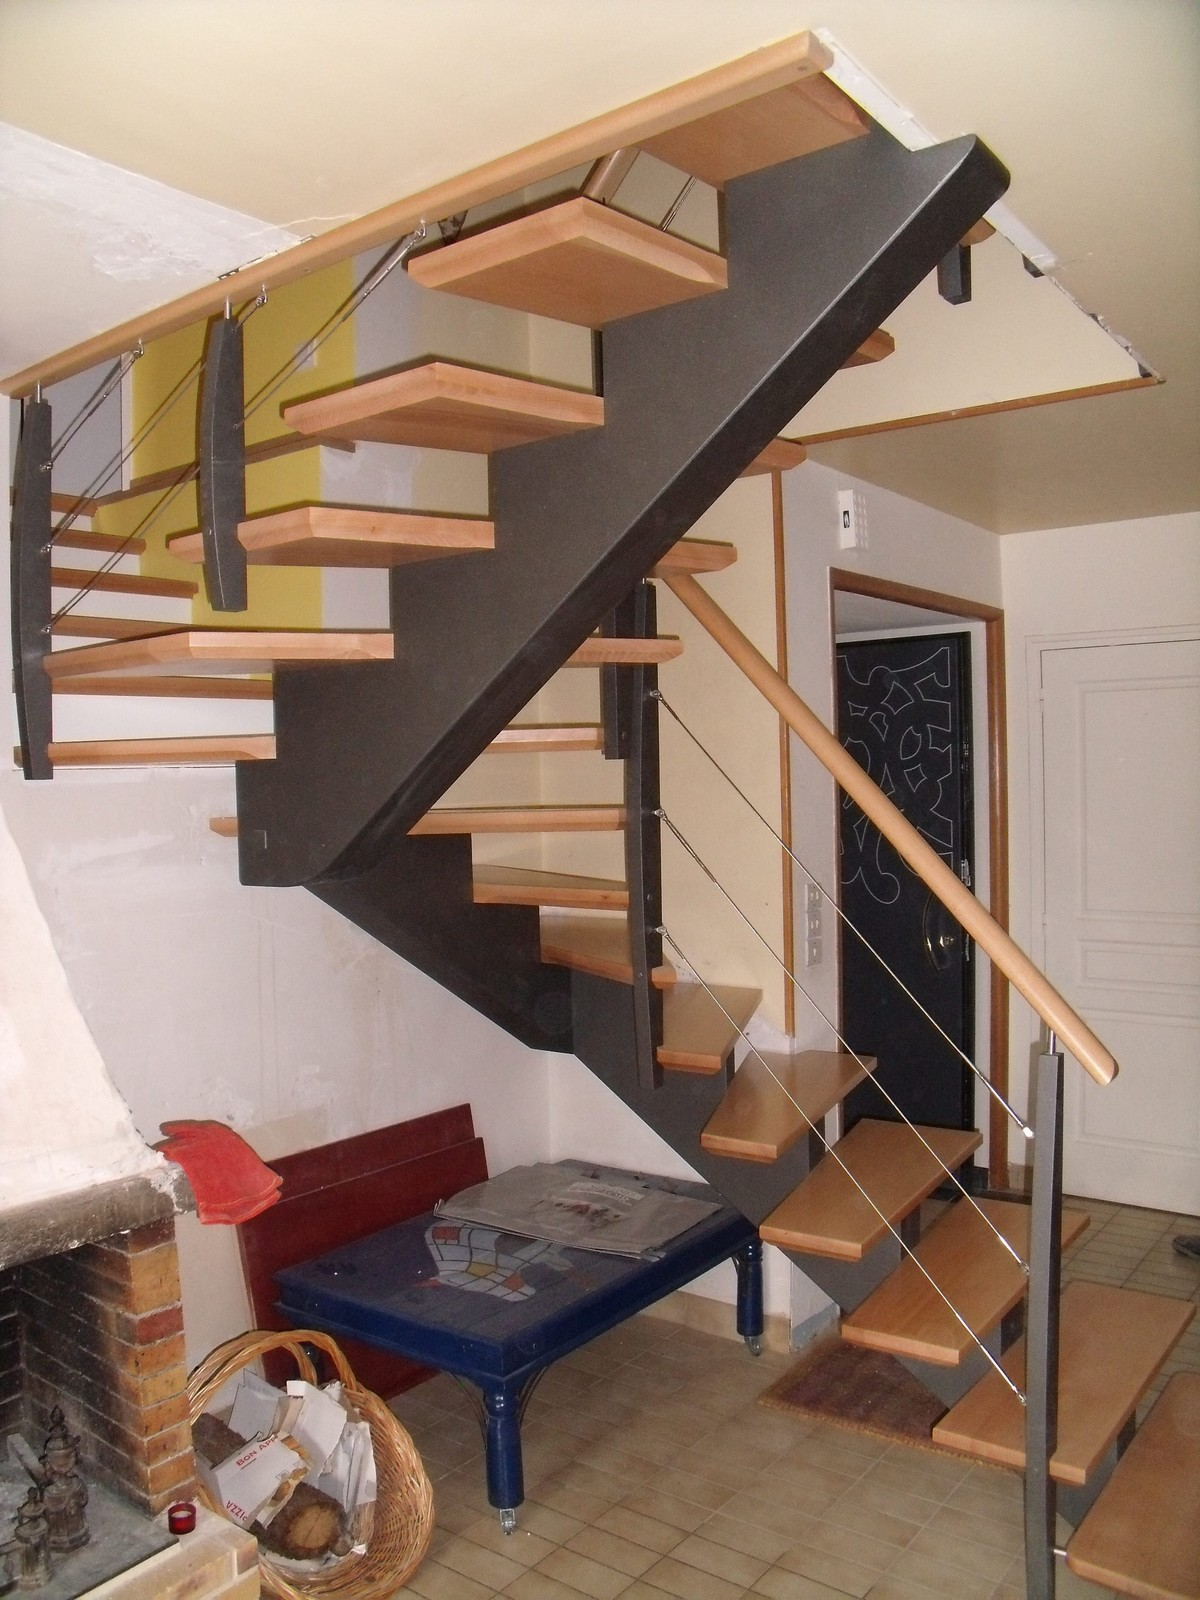 escalier glotin trendy escalier glotin with escalier glotin perfect beautiful escalier salon. Black Bedroom Furniture Sets. Home Design Ideas